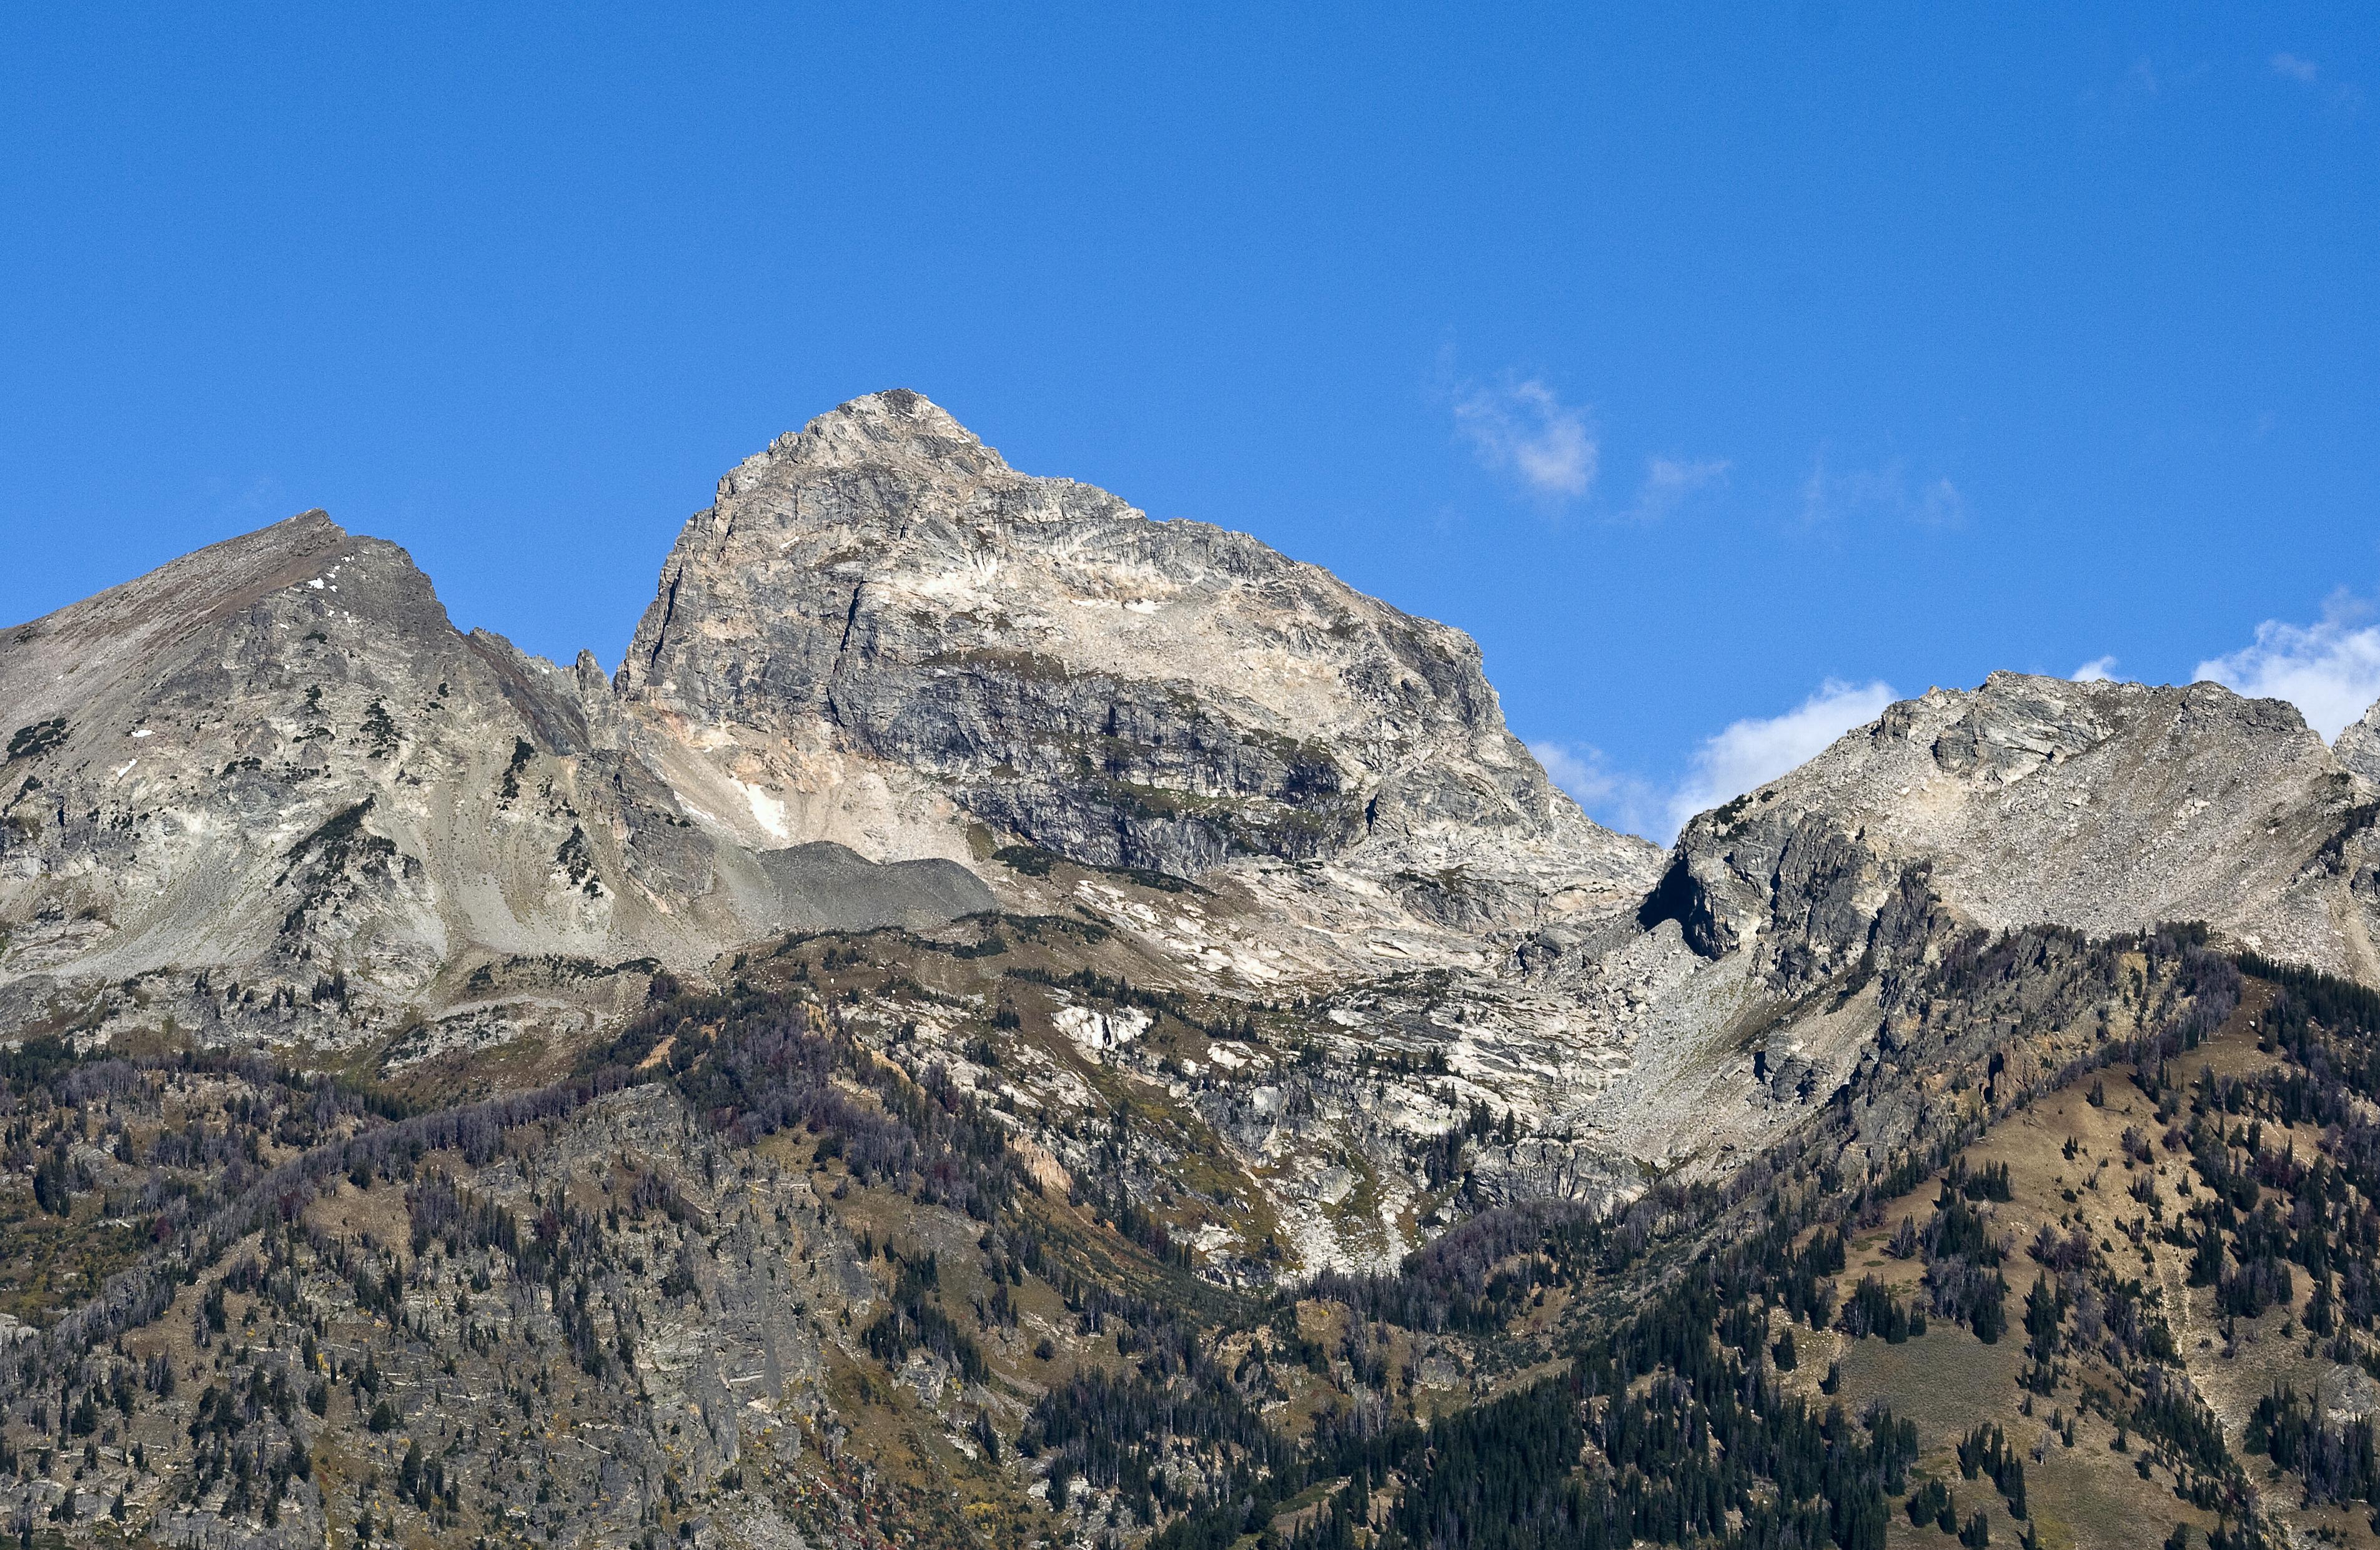 Http Commons Wikimedia Org Wiki File Buck Mountain Gtnp2 Jpg